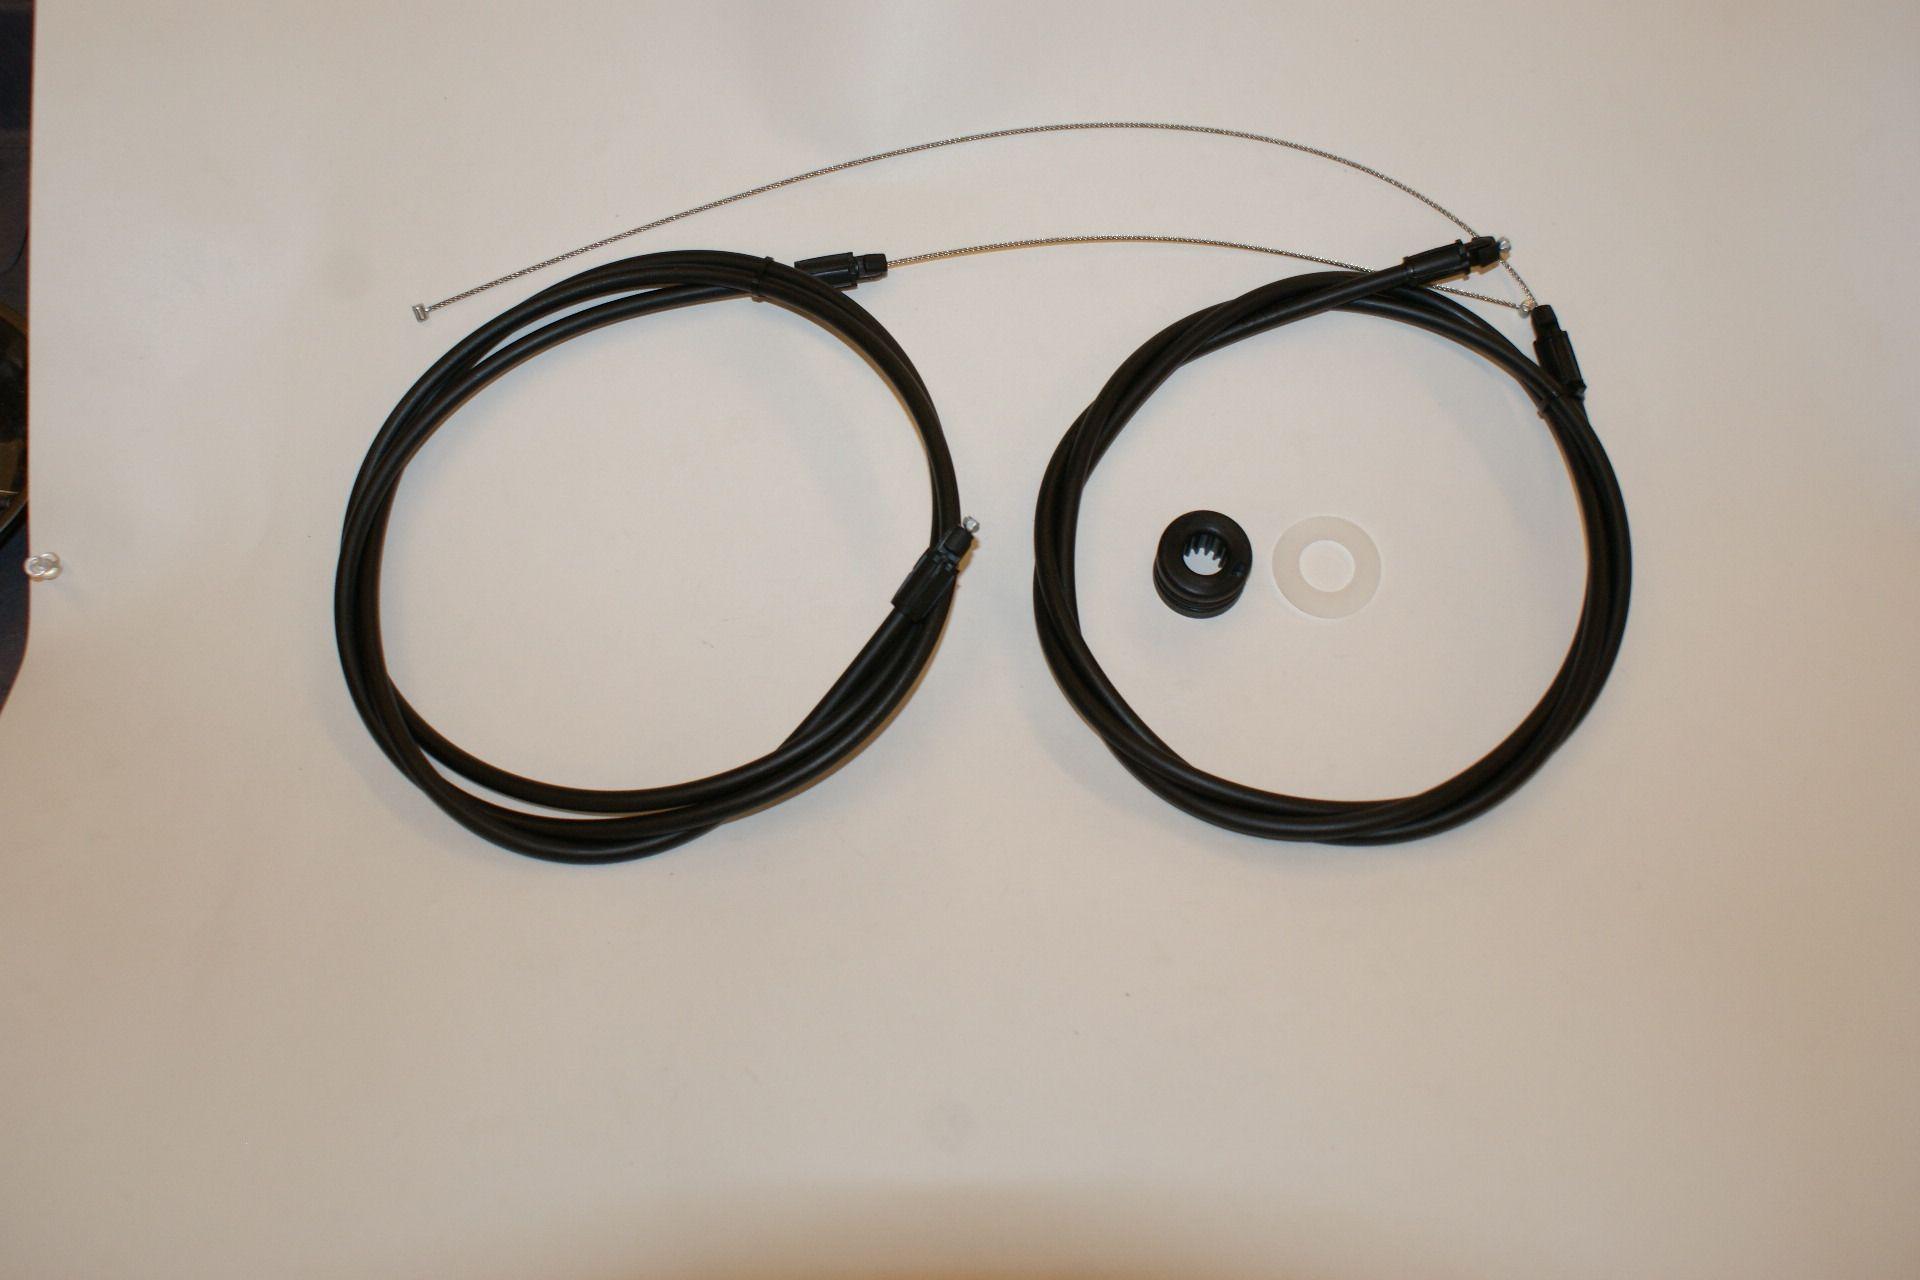 hight resolution of cable repair kit for minn kota maxxum trolling motors